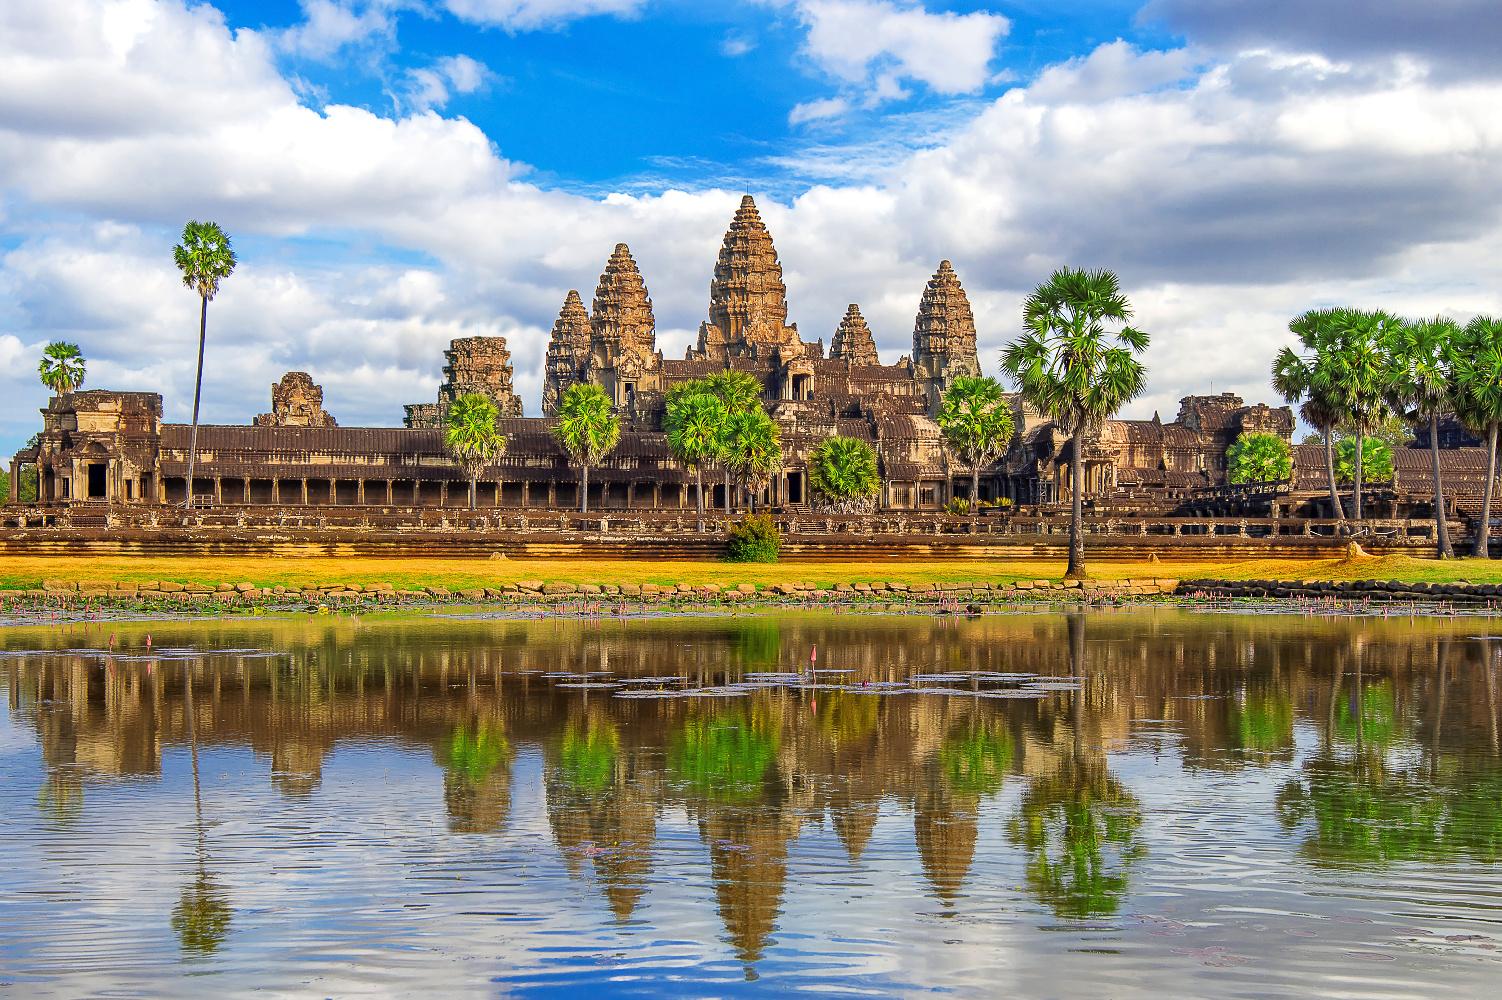 Kambodscha Siam Rep Angkor Wat Tempel ©123RF